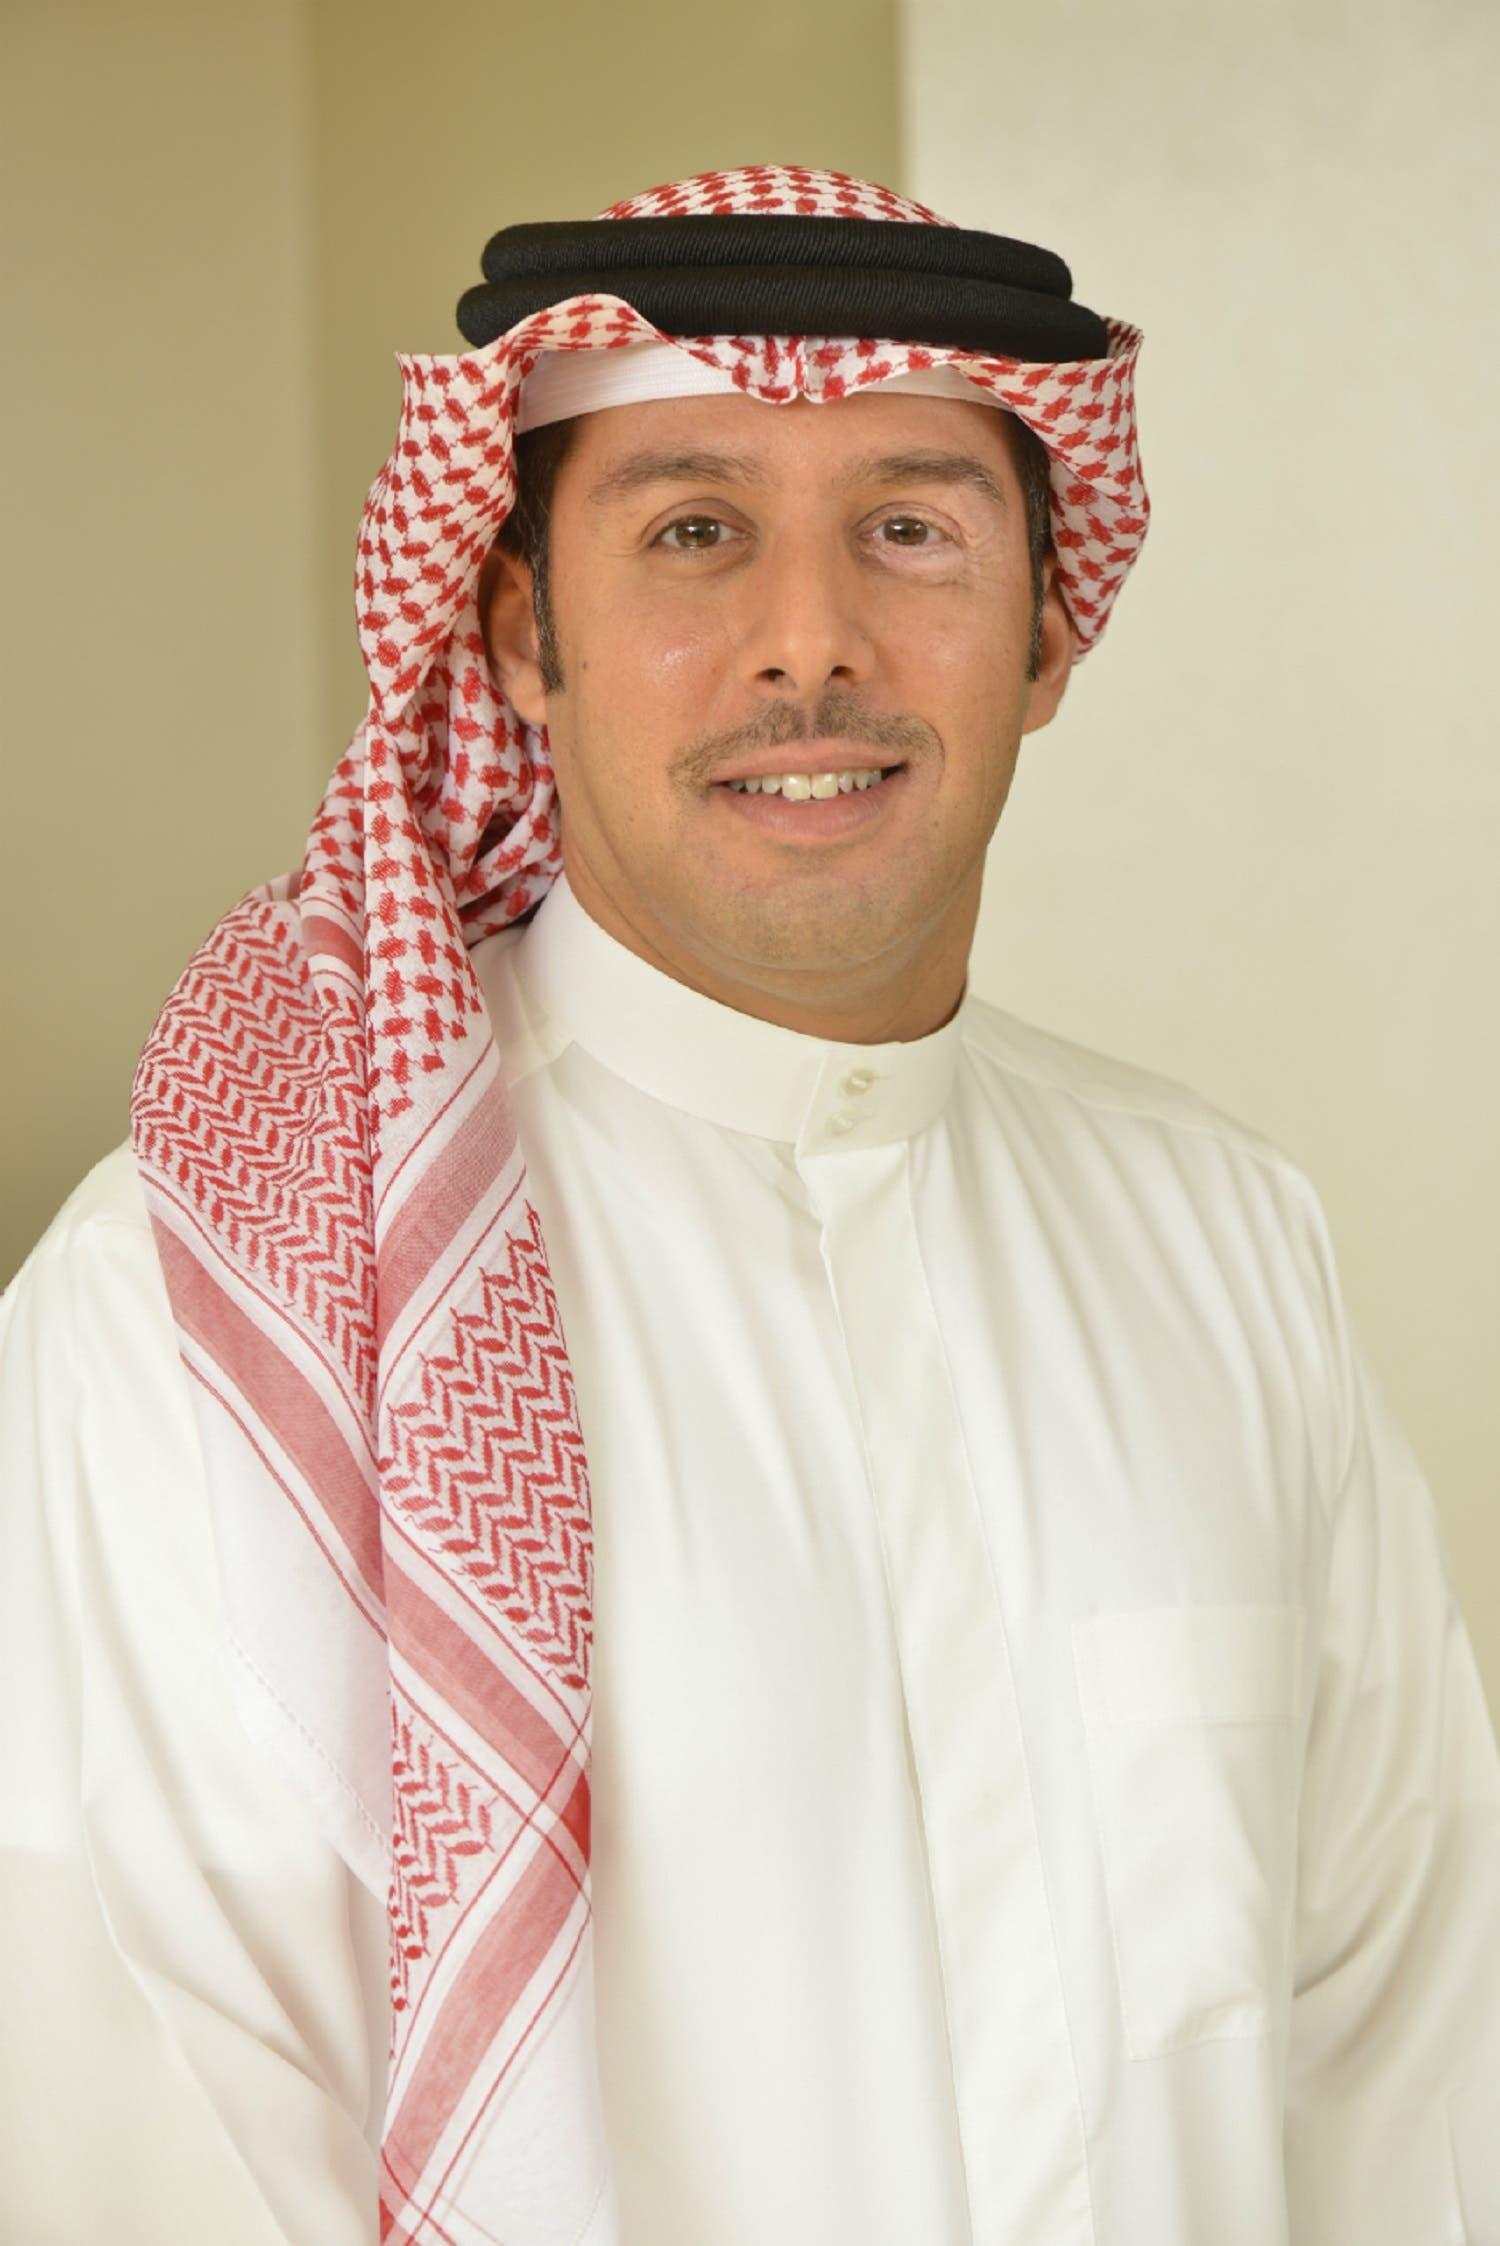 Khalid Al Rumaihi, Bahrain Economic Development Board Chief Executive. (Supplied)